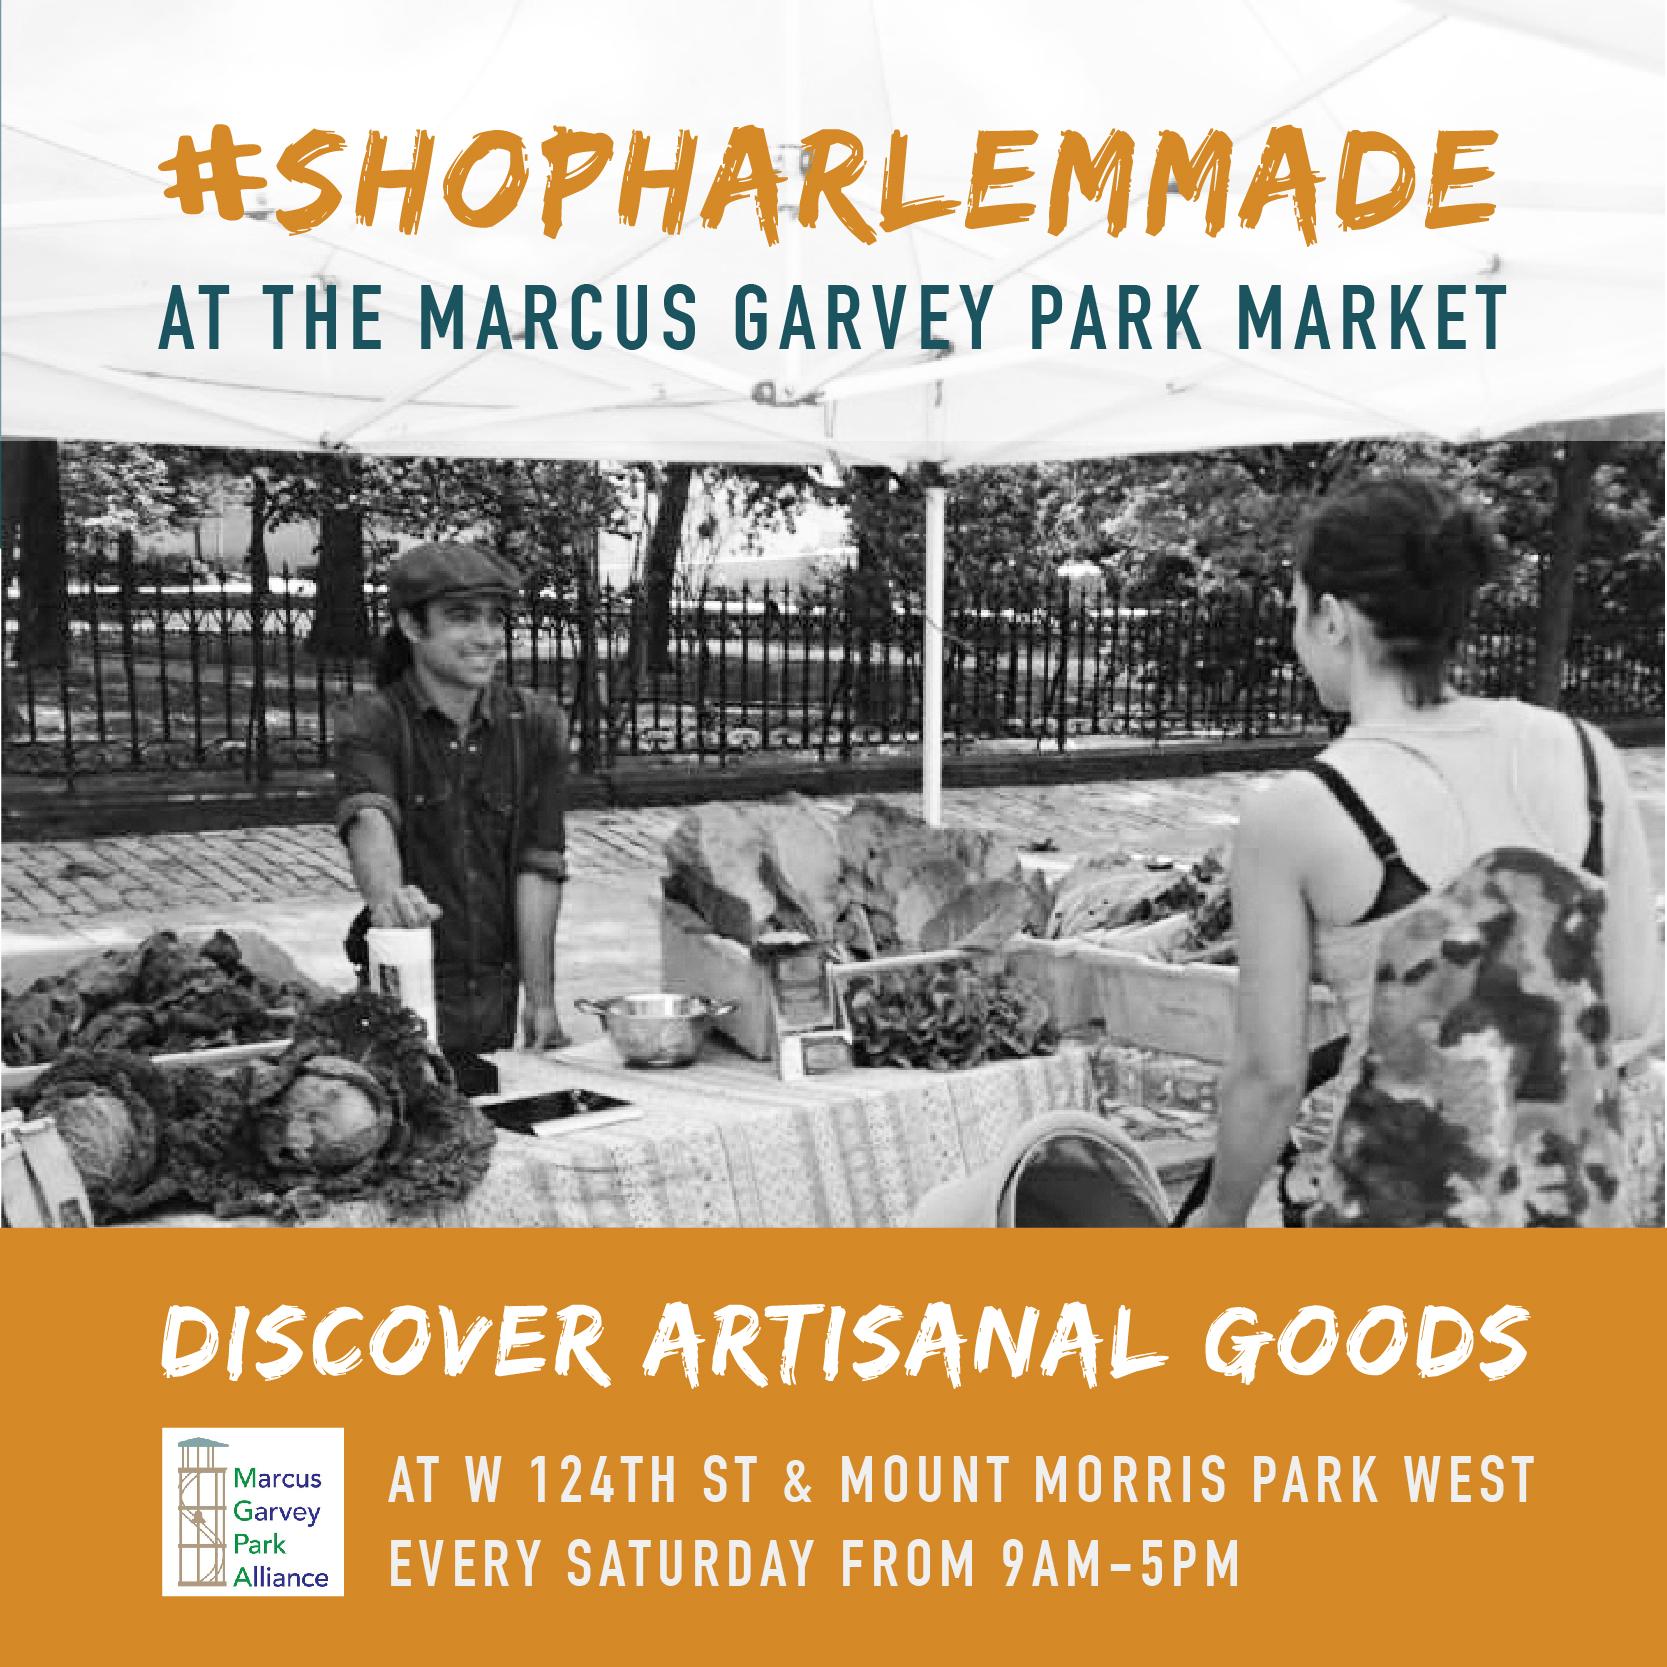 marcus_garvey_park_market.jpg